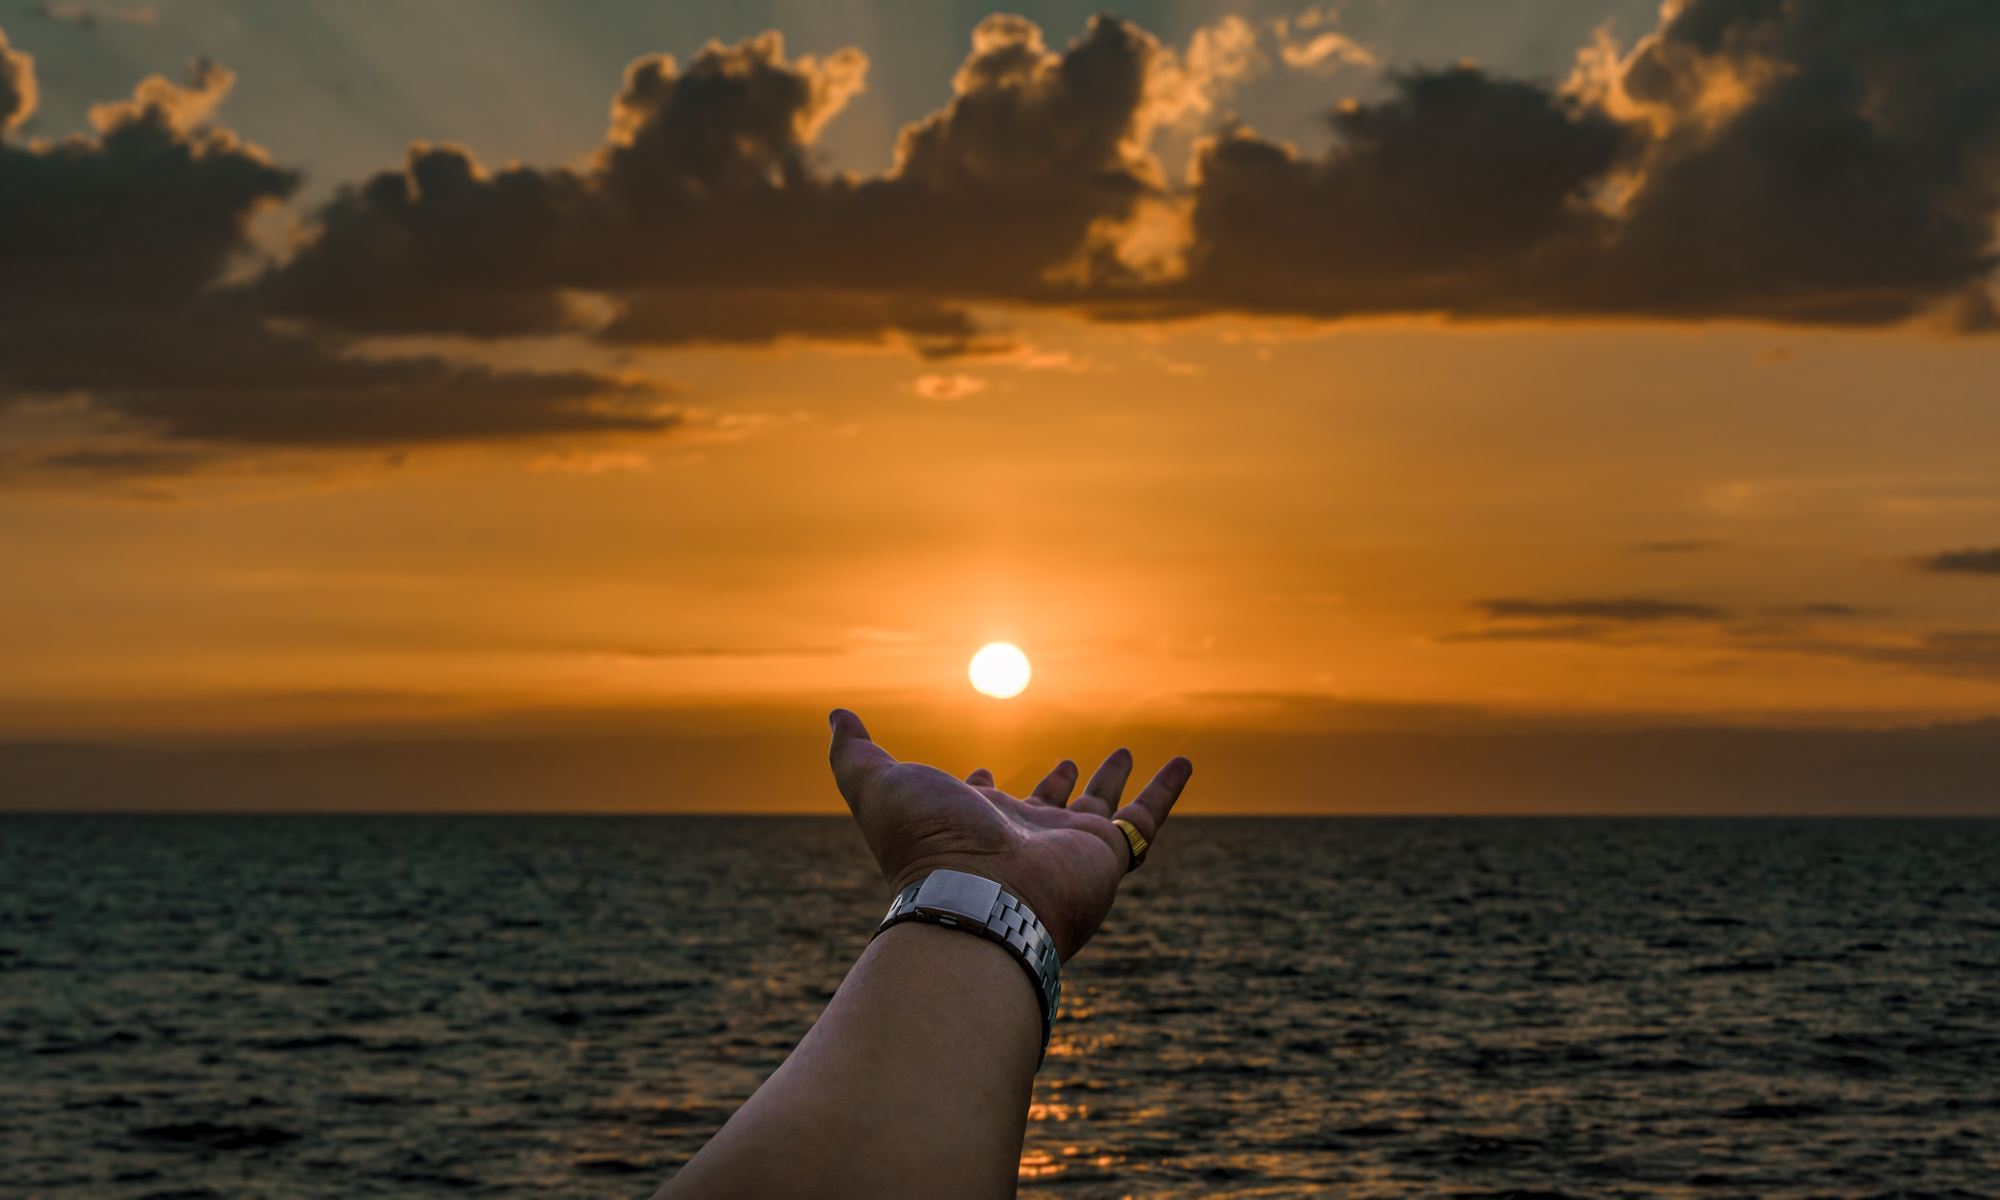 Motivated person extending hand toward ocean during golden hour